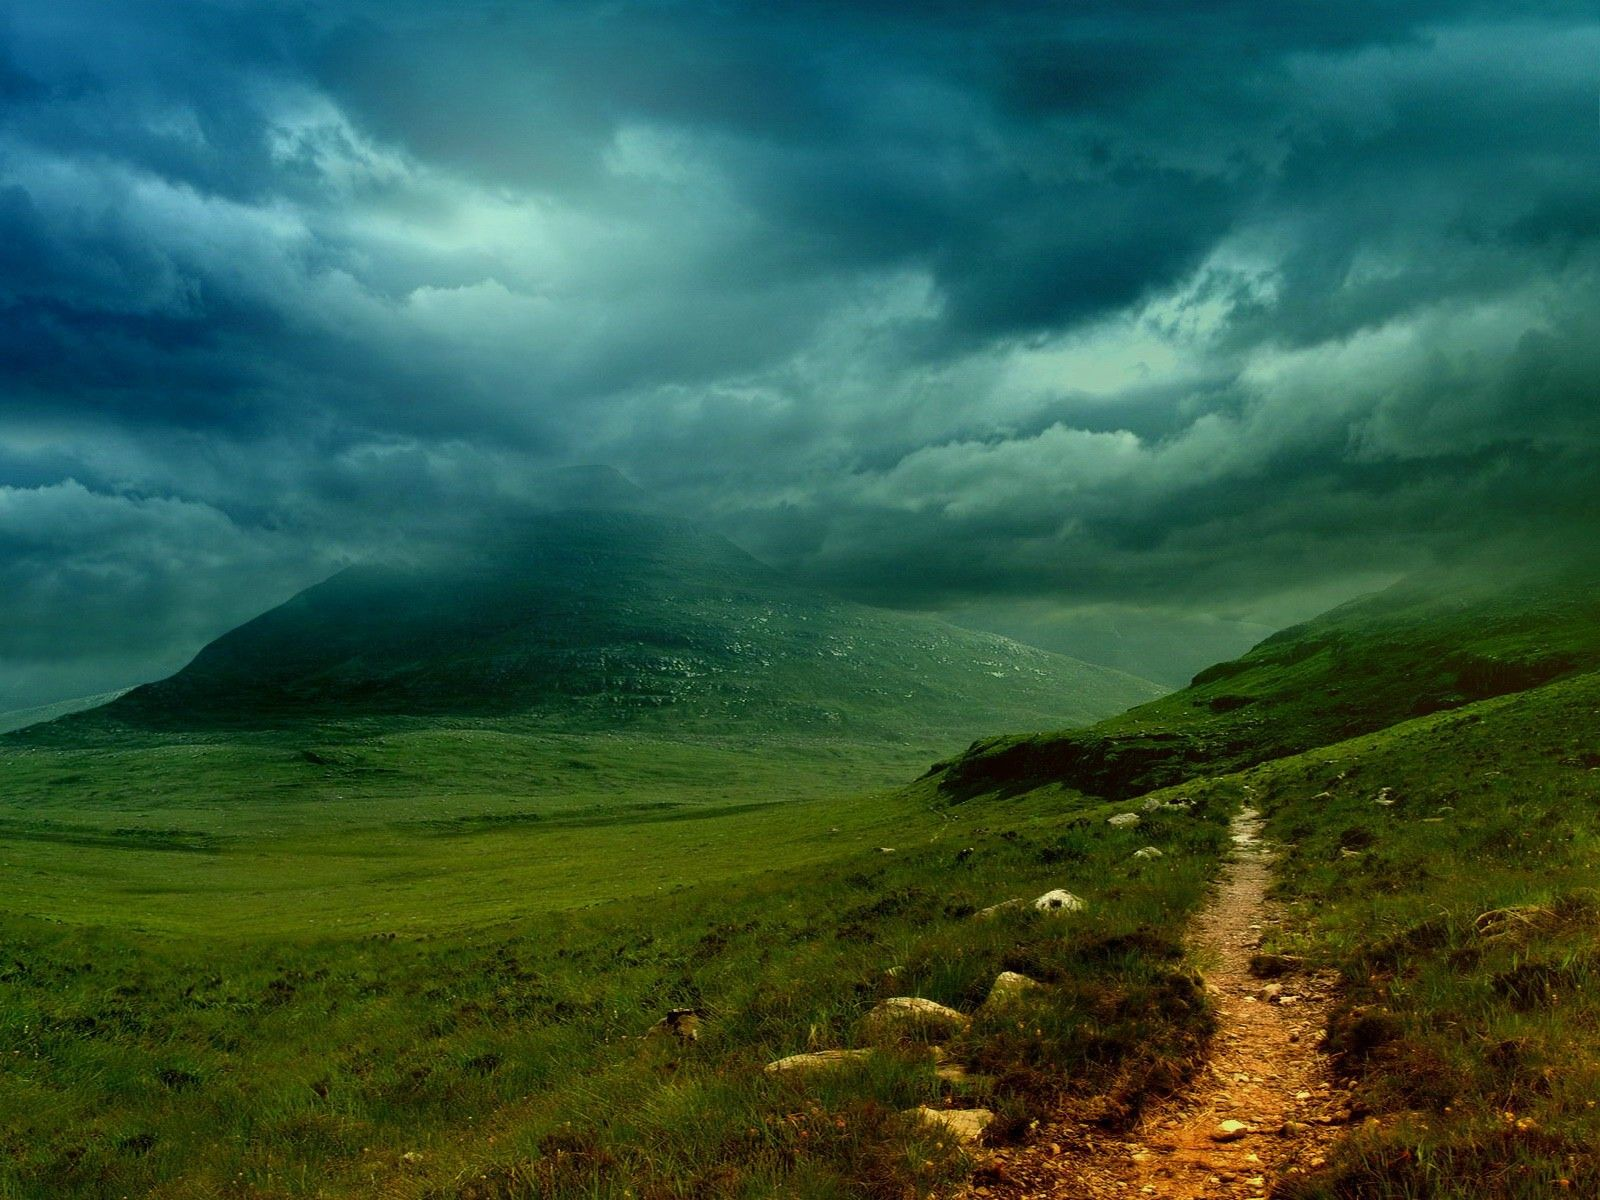 Incredible shot of the Irish countryside - Imgur